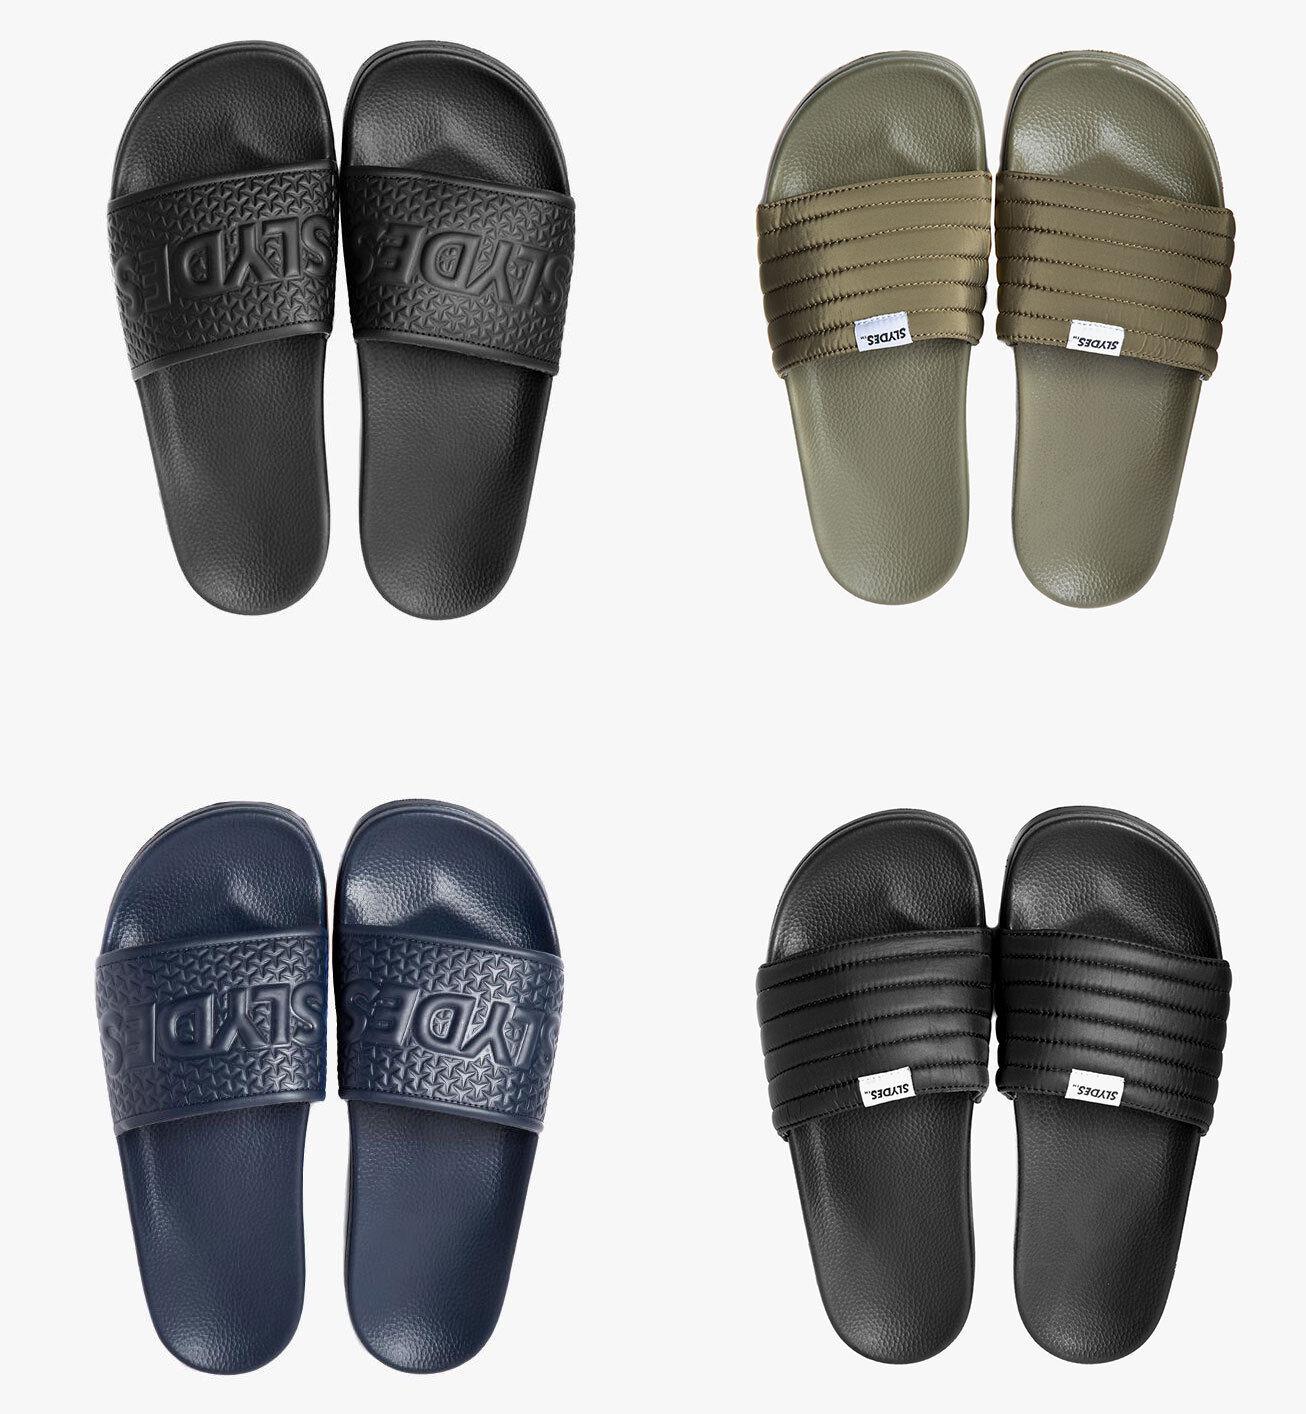 b0fbb77926bf Details about Mens Slydes Flip Flops Slider Sandals Black Khaki Navy Camo